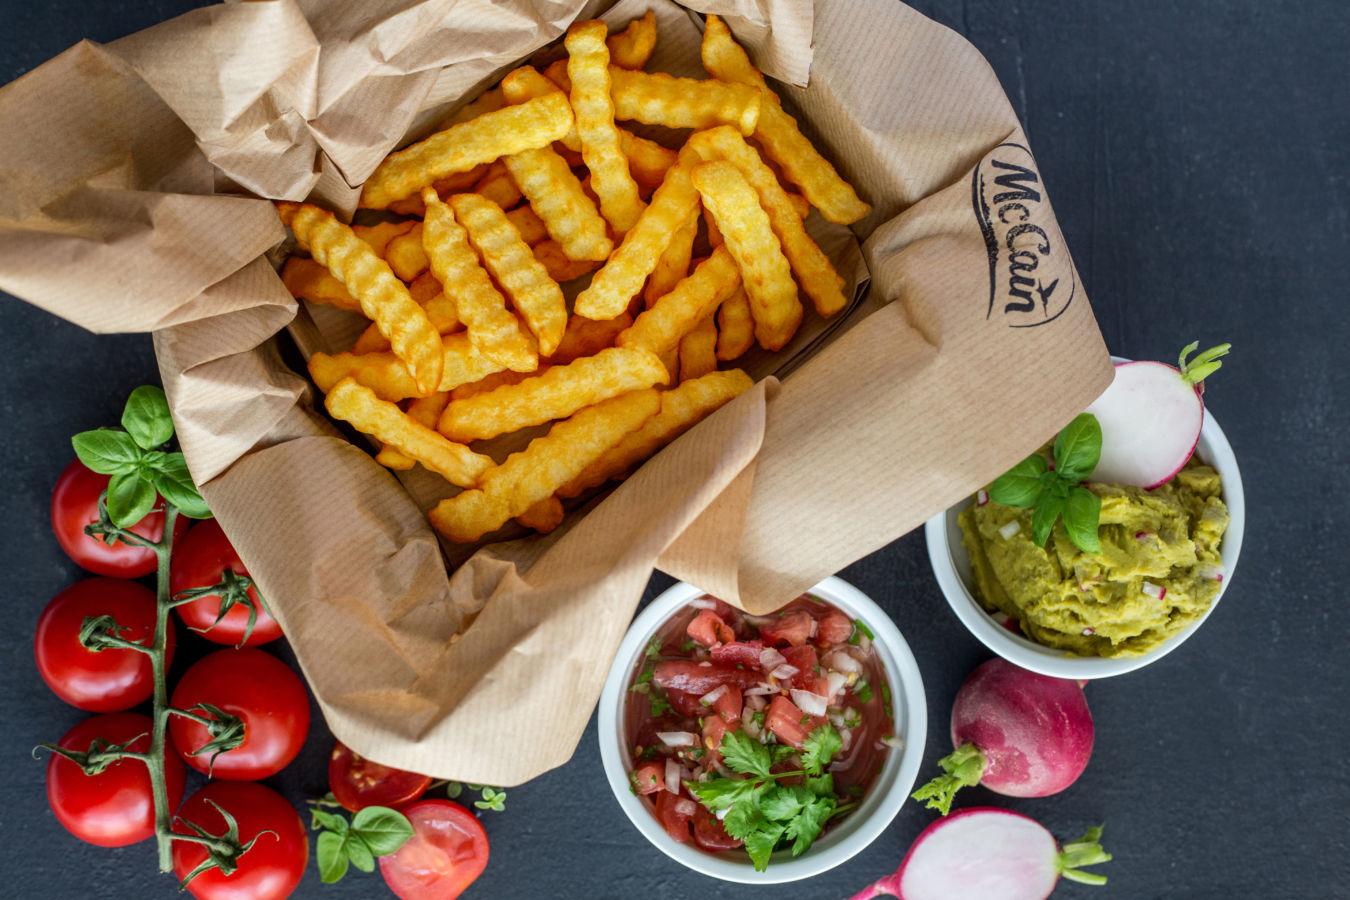 McCain hranolky 1.2.3 Fries – Chutné jídlo na každý den